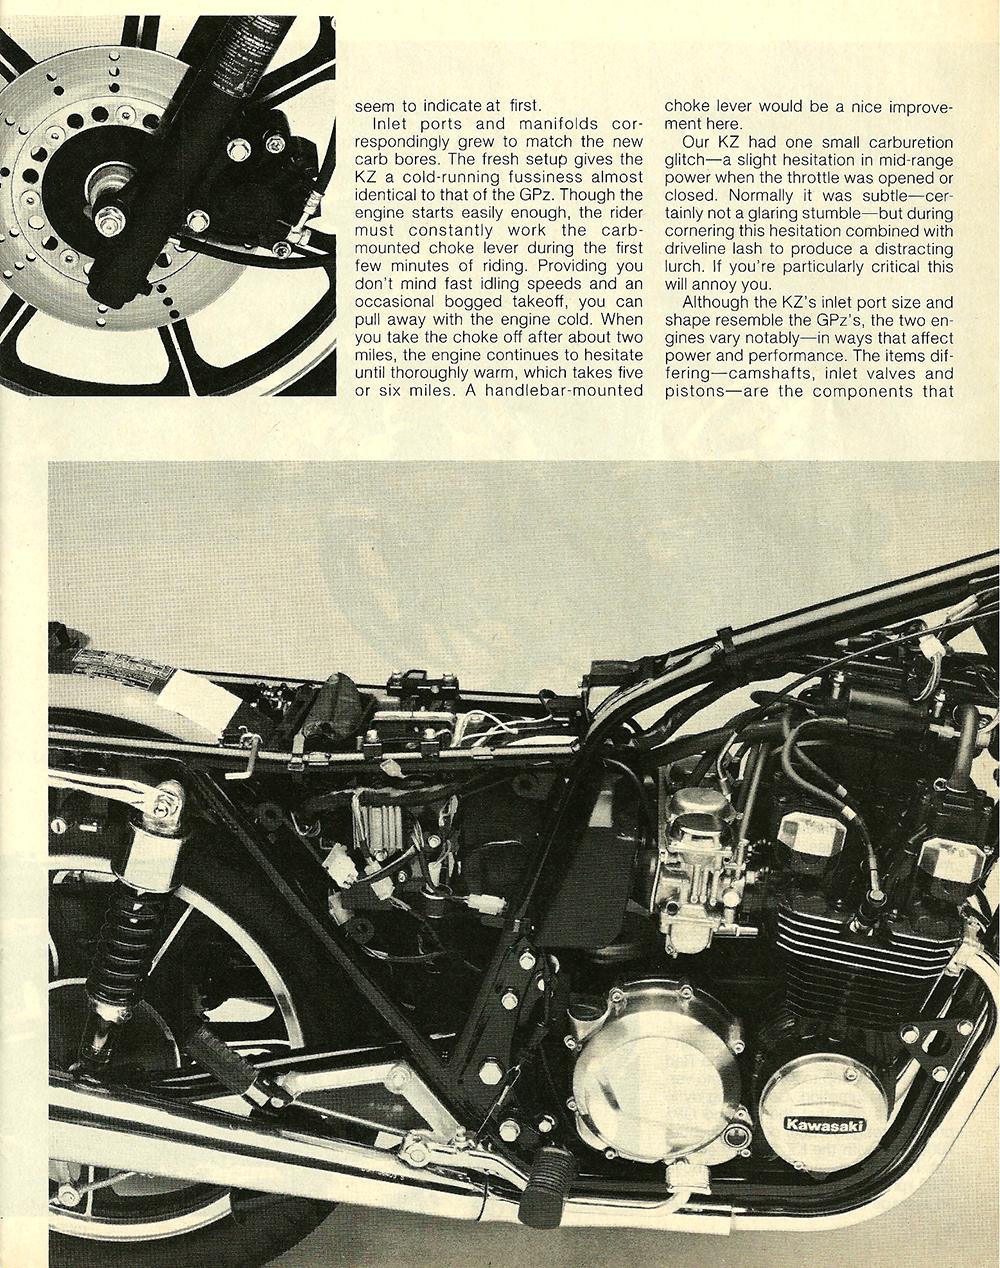 1983 Kawasaki KZ550 A4 road test 5.jpg